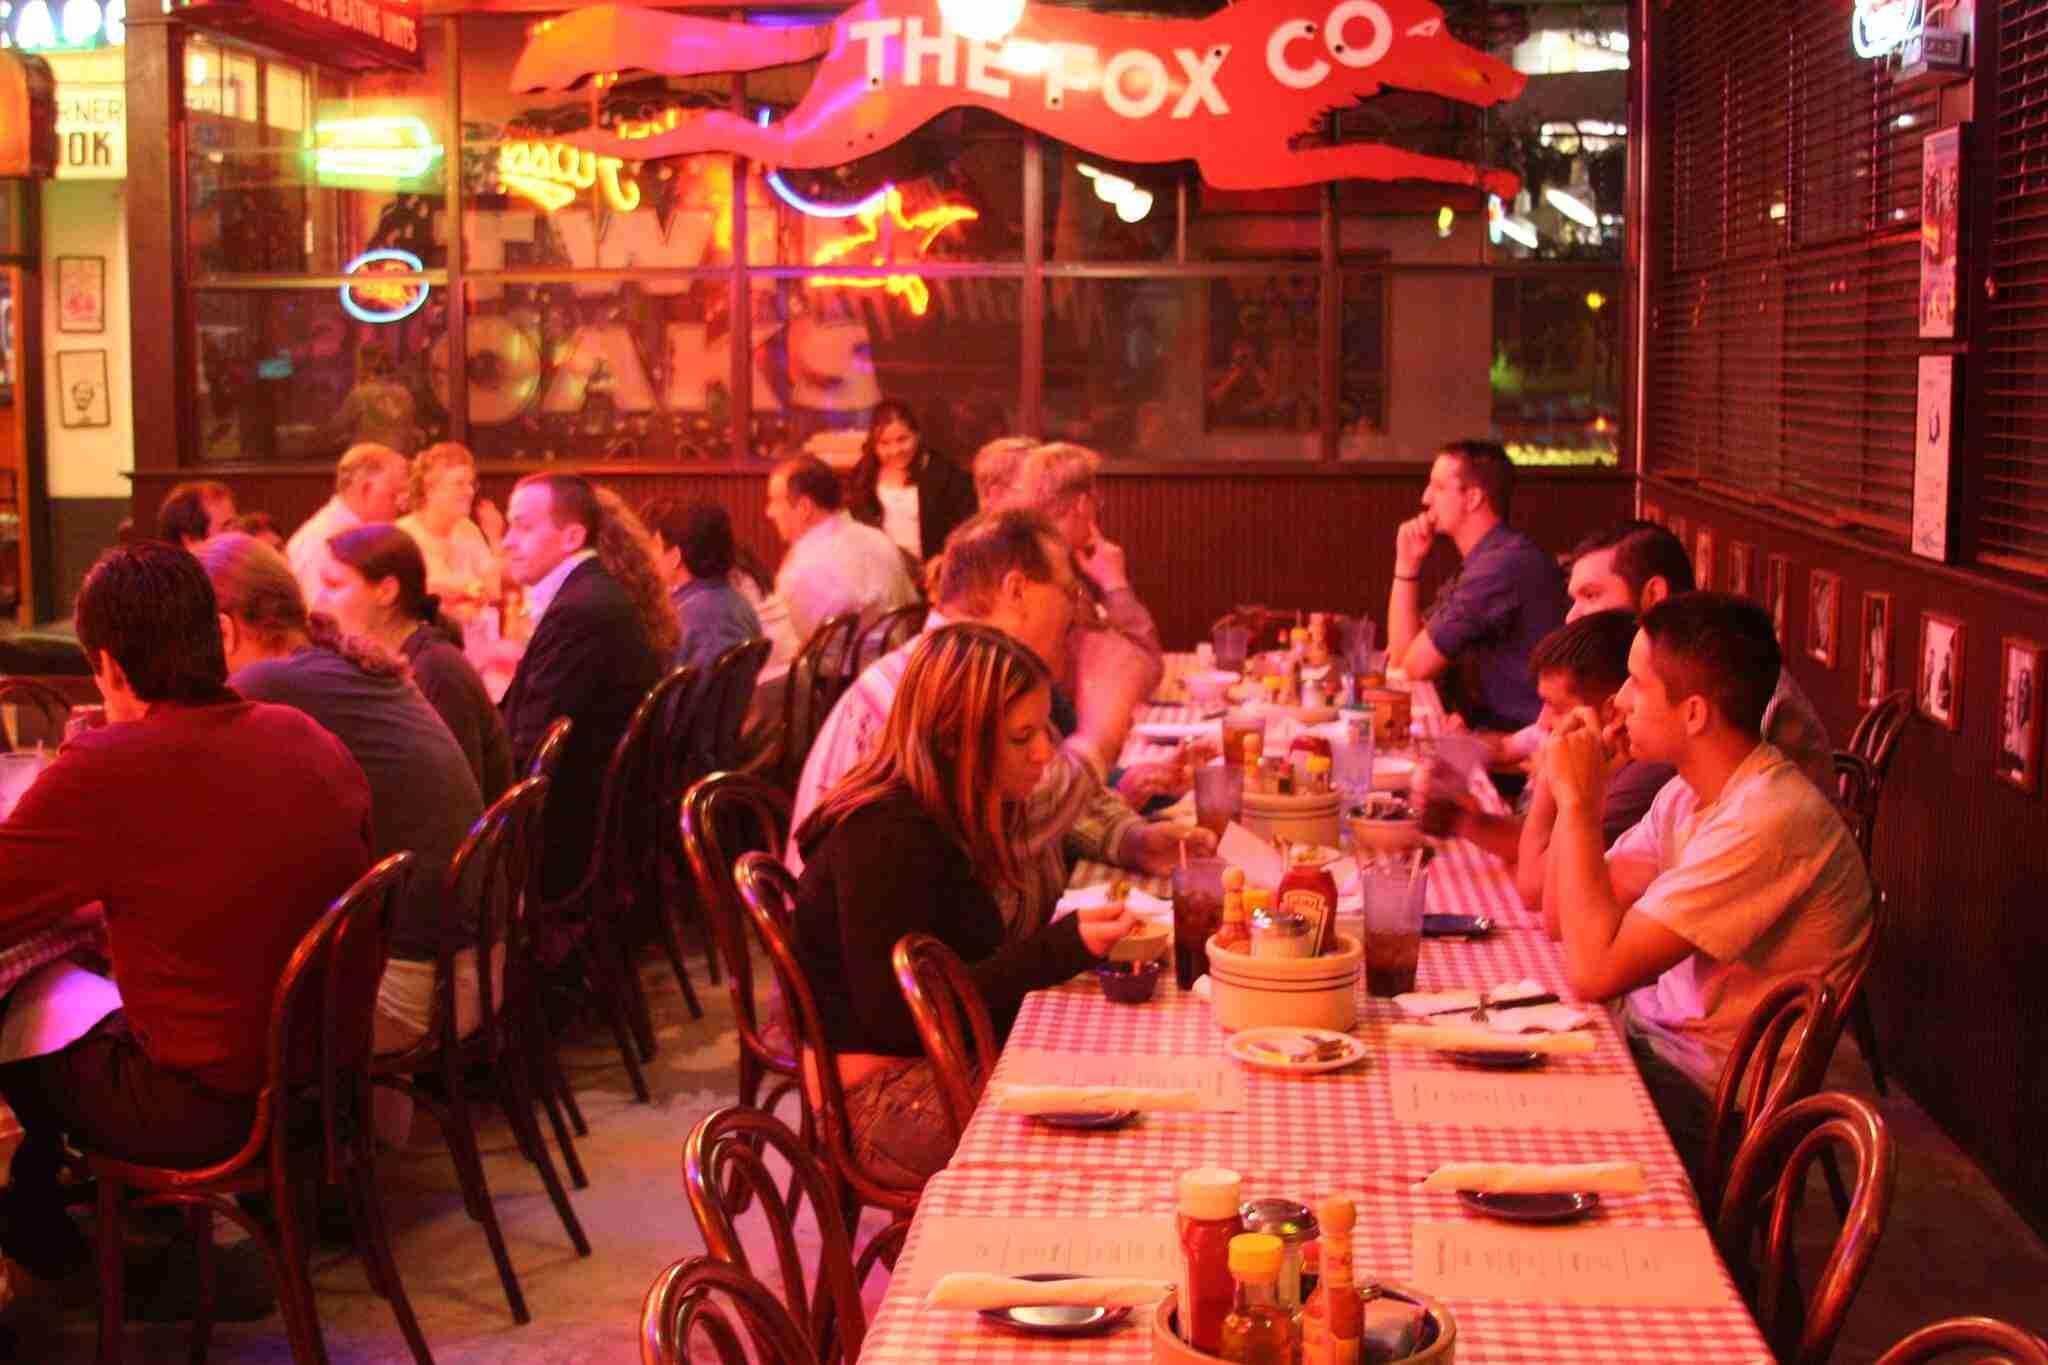 attract-restaurant-customers